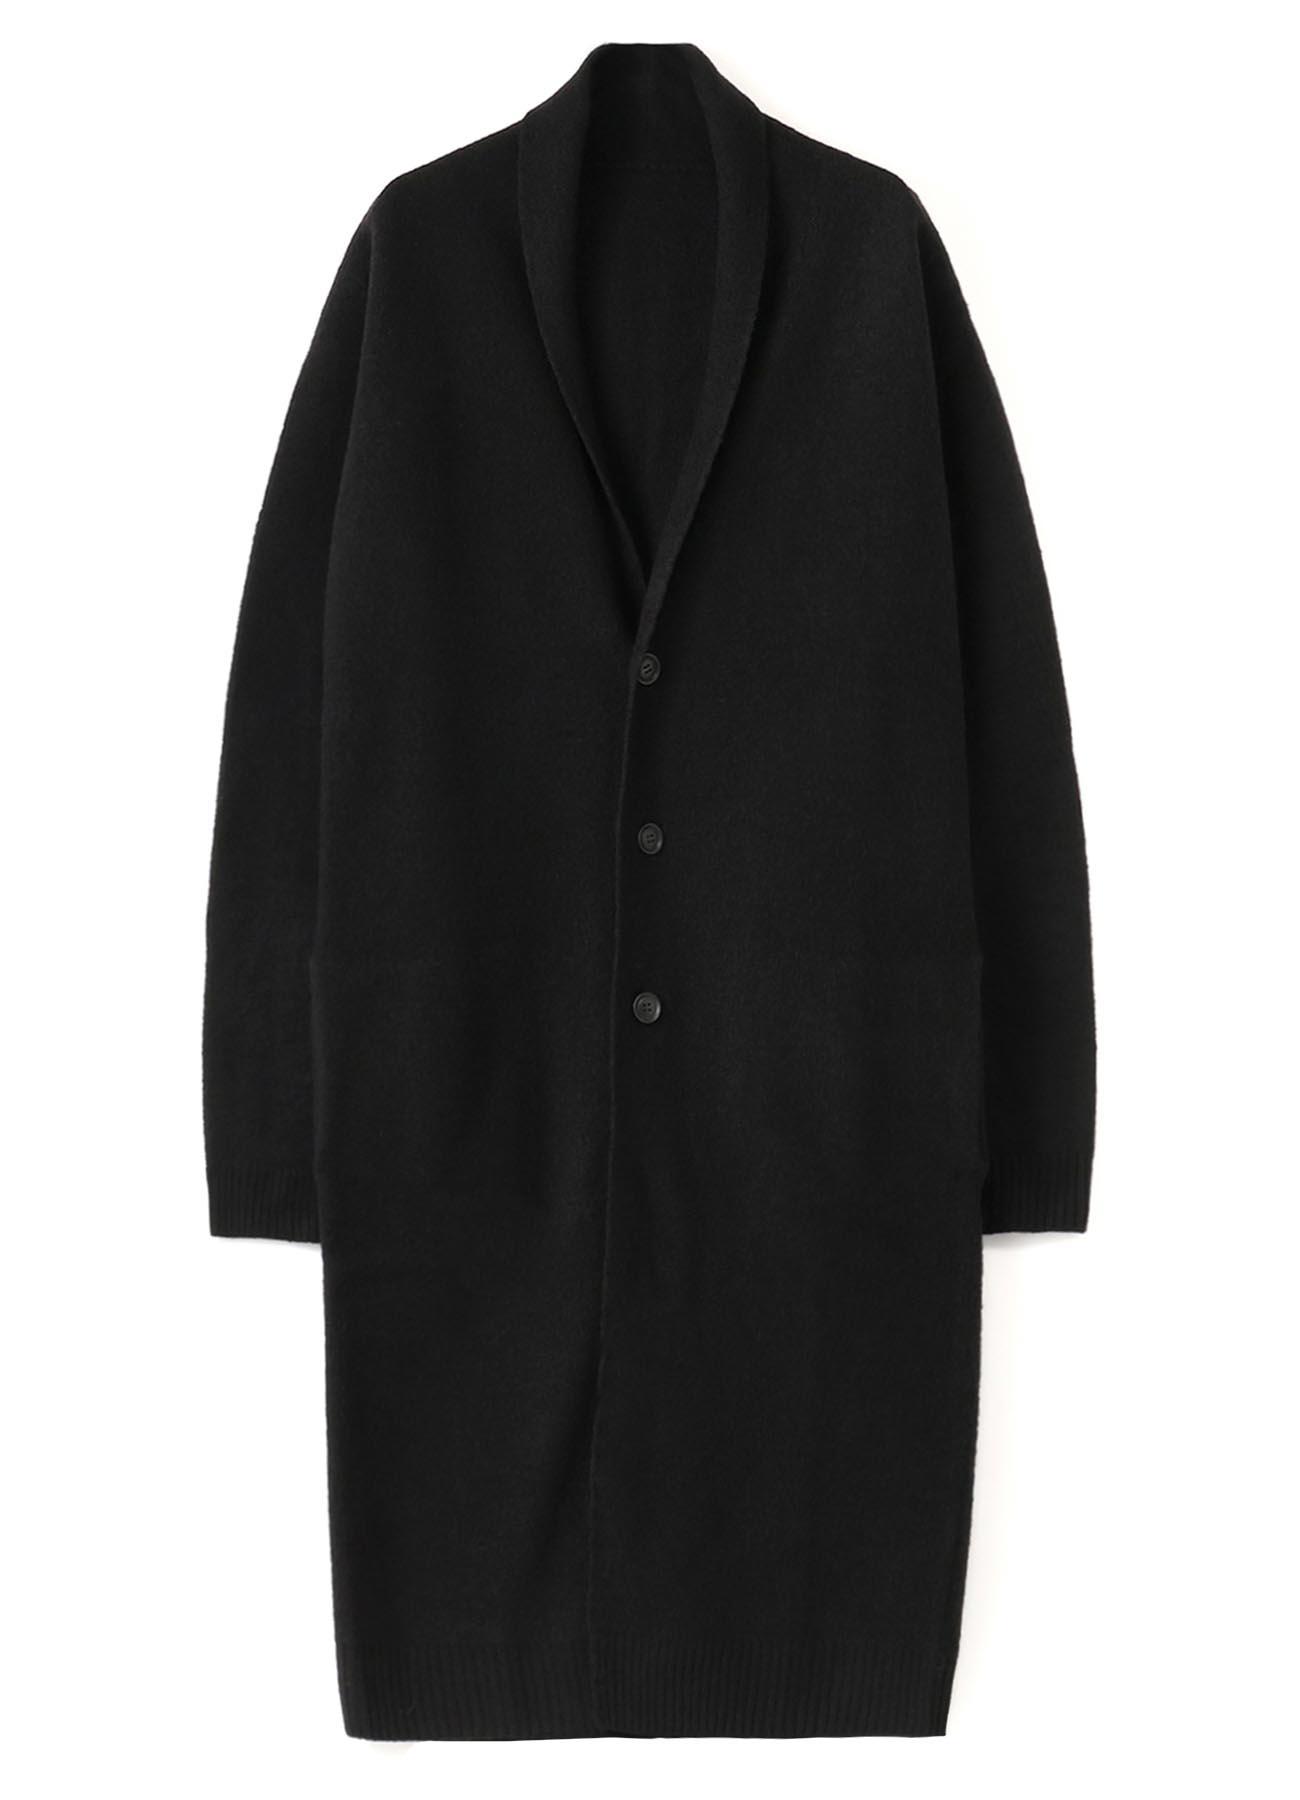 W/Boil Long Gown Knit